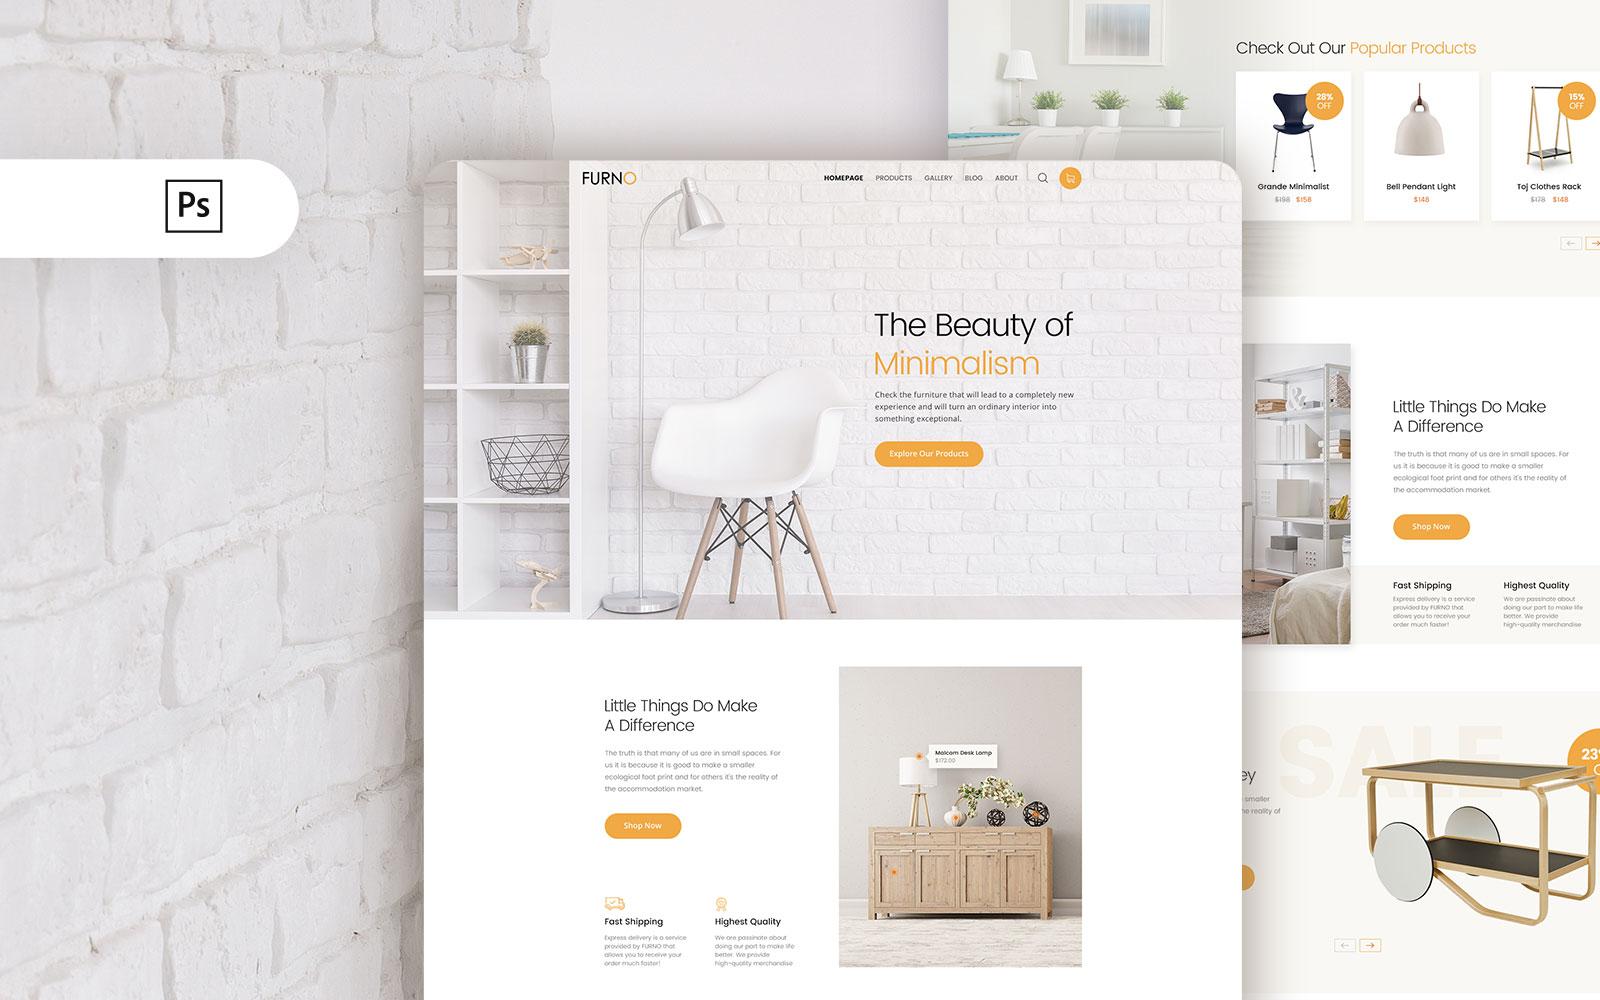 """Furno - Furniture Online Shop Landing"" BootstrapPSD模板 #107220"